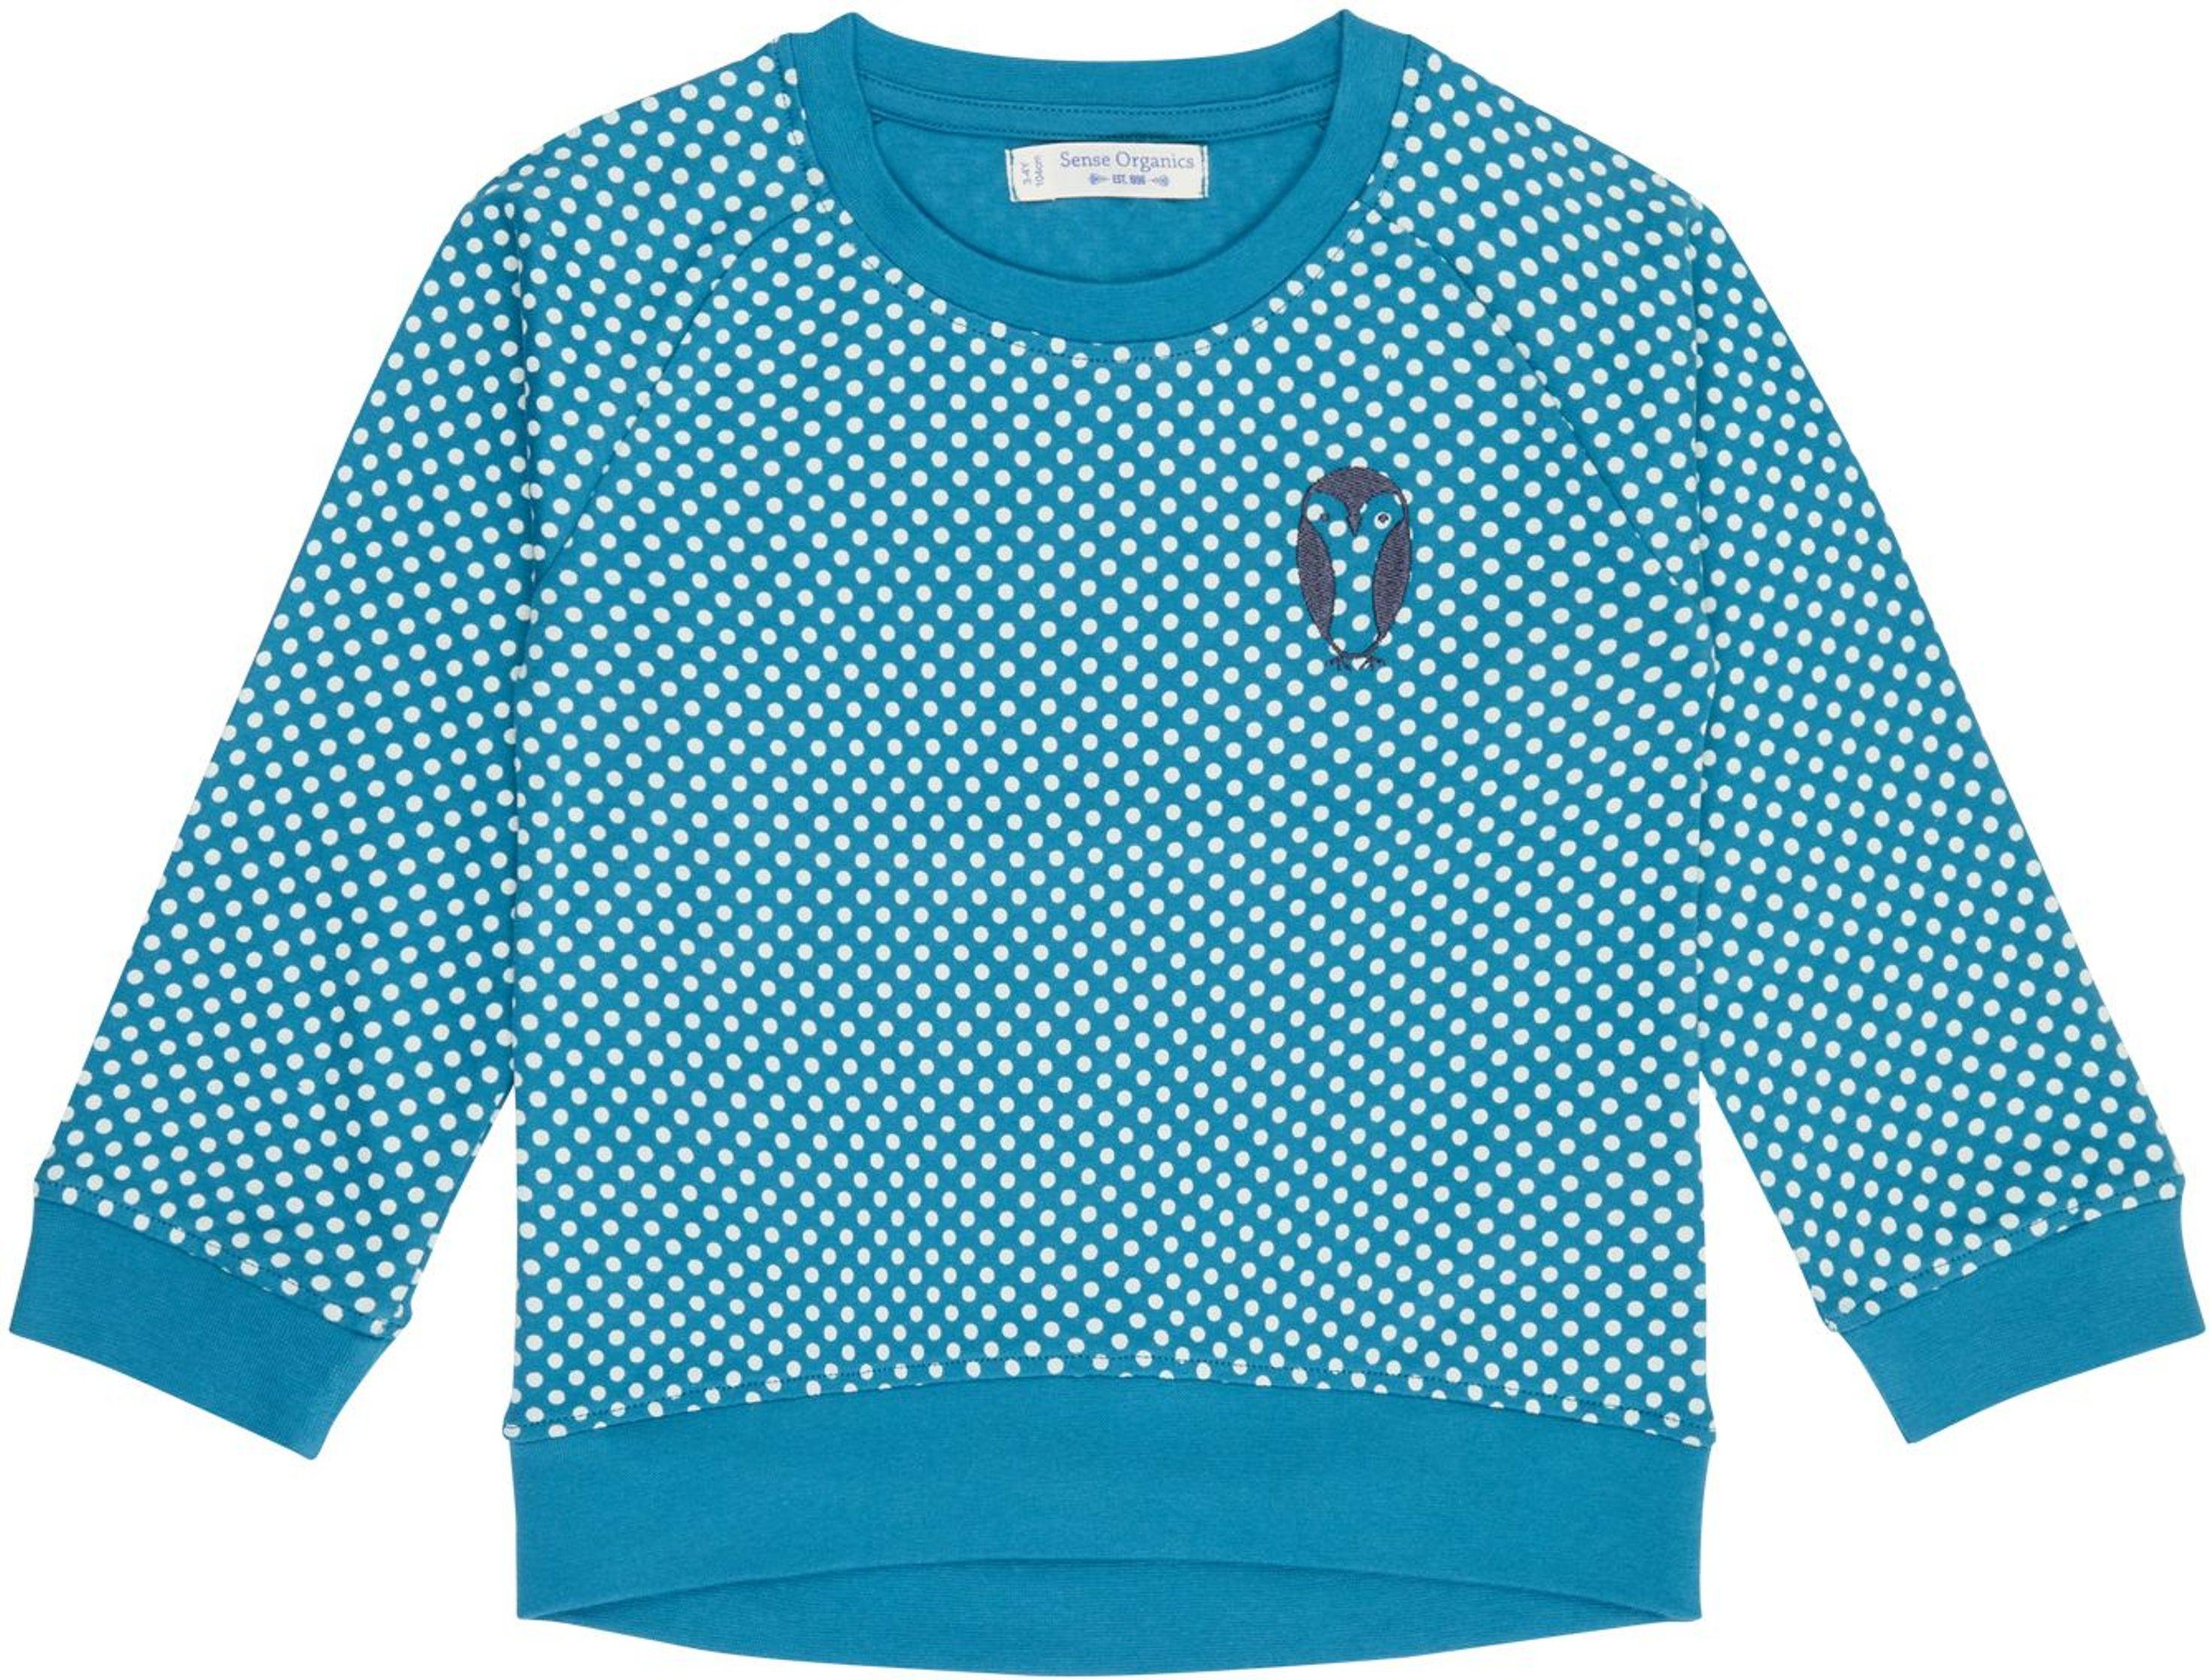 Sense Organic DENA Raglan Shirt AOP polka dots